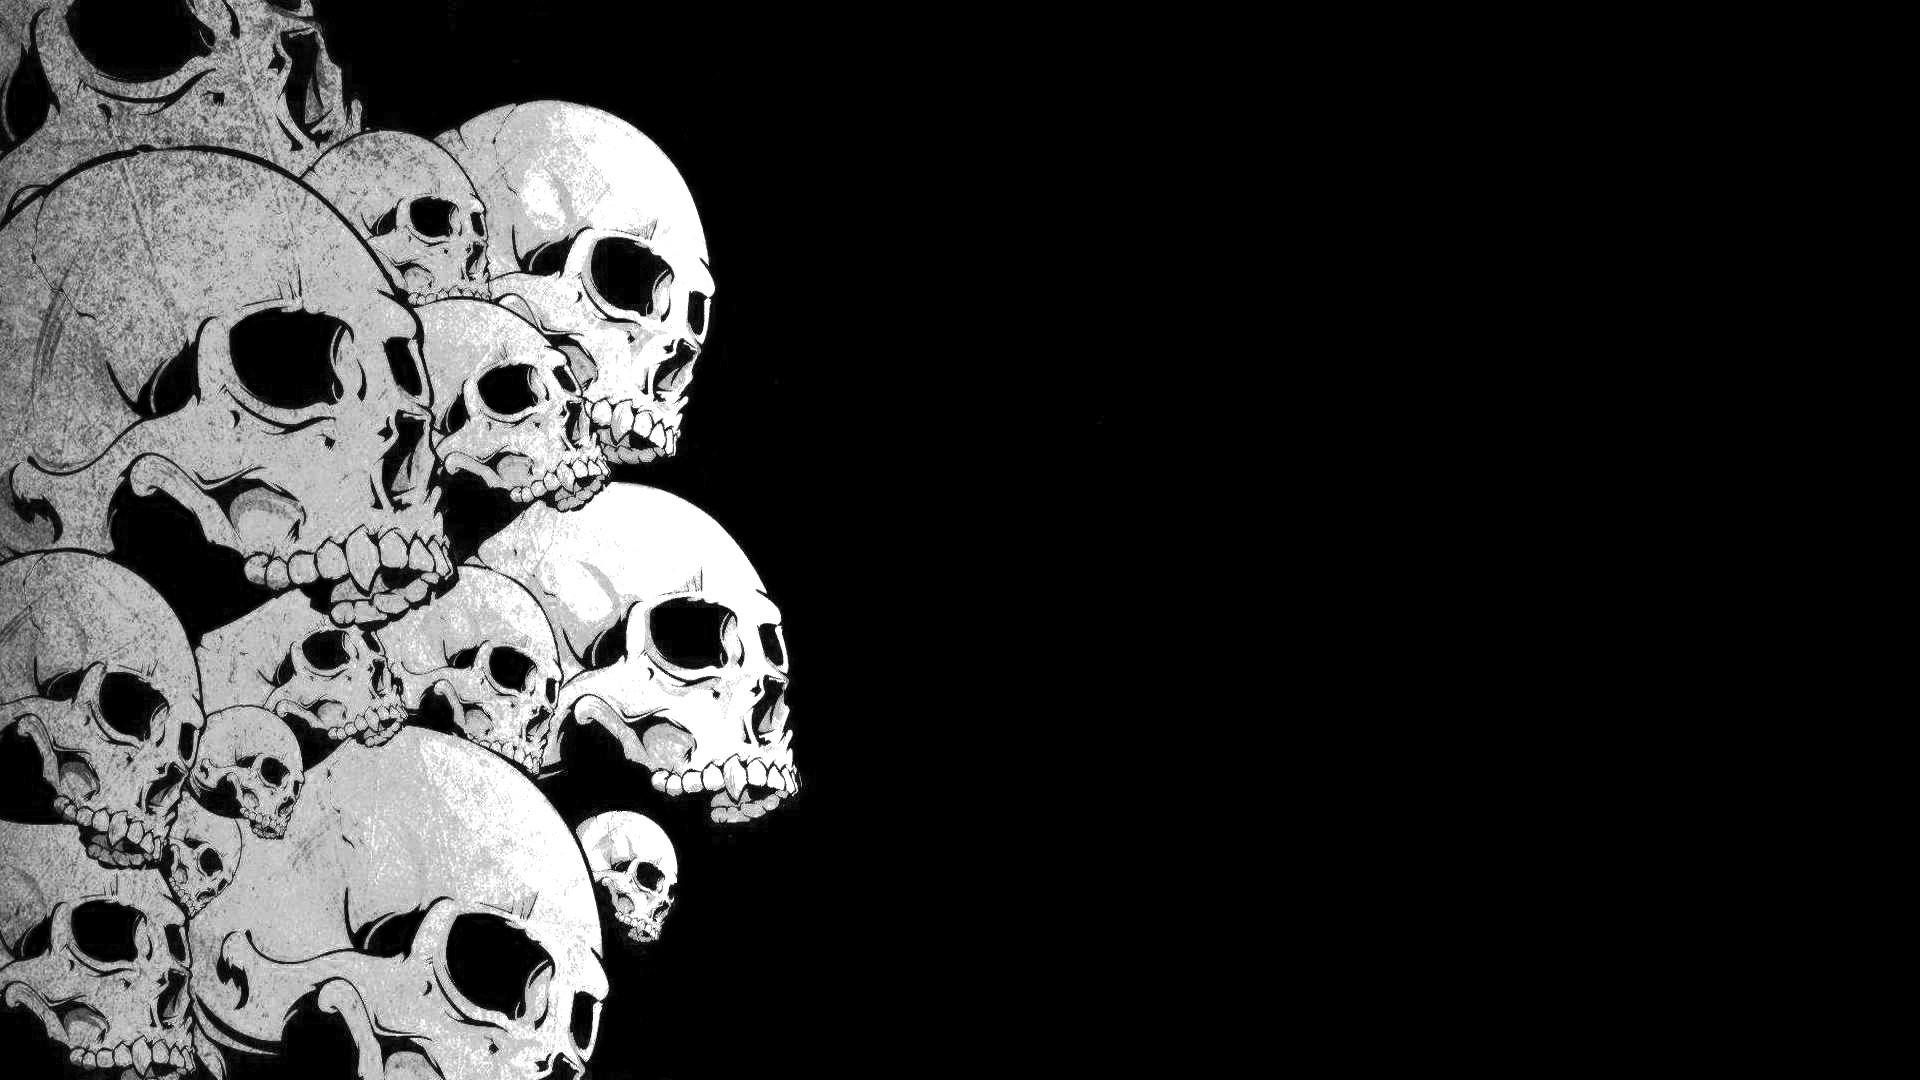 HD Skull Wallpapers 1080p : Find best latest HD Skull Wallpapers 1080p for  your PC desktop background & mobile phones.   hd wallpaper   Pinterest    Skull …